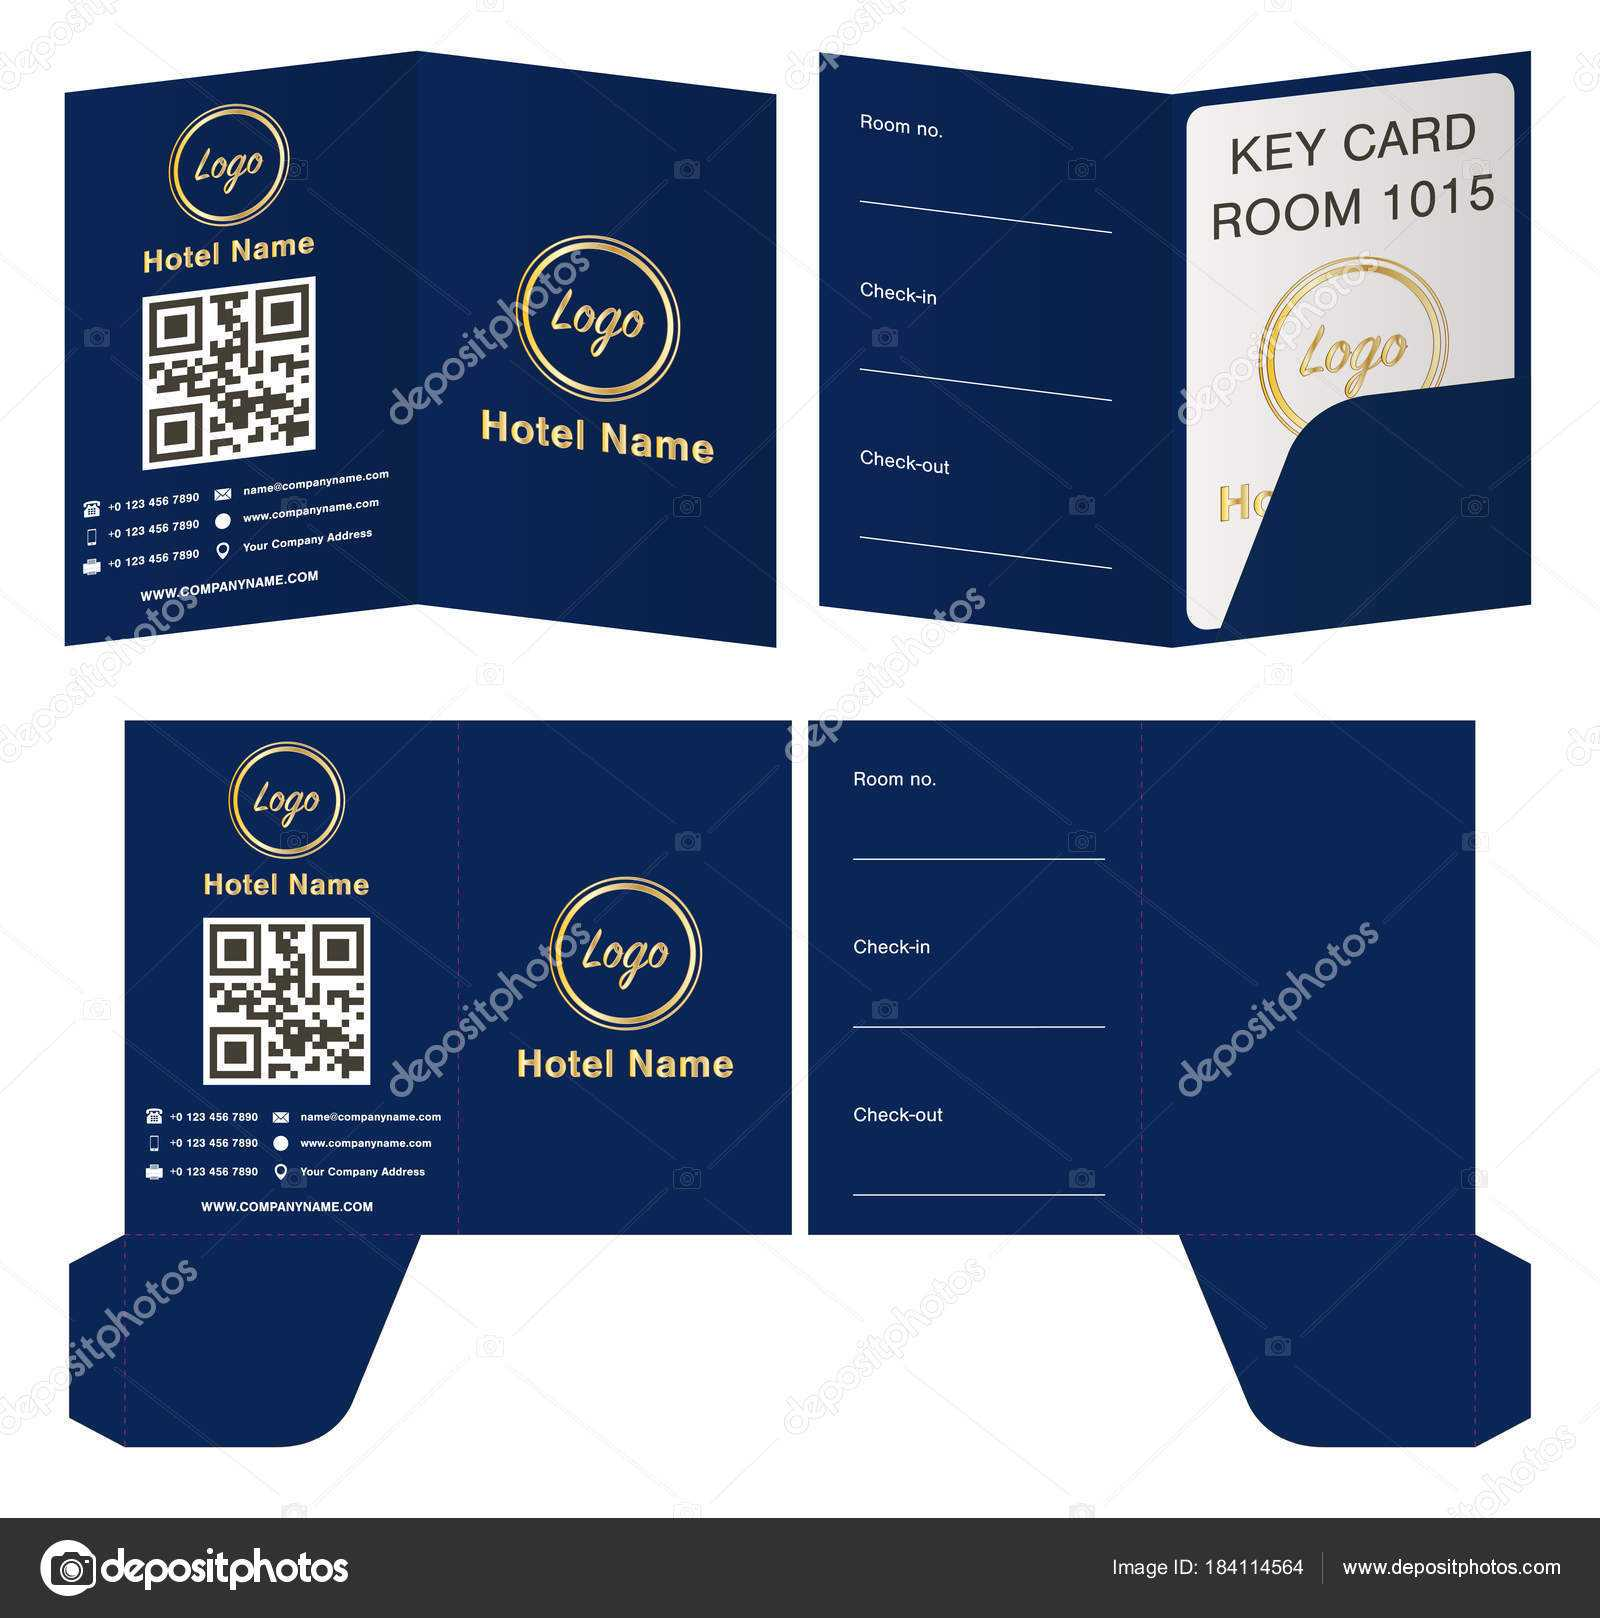 Key Card Holder Template   Hotel Key Card Holder Folder Regarding Hotel Key Card Template